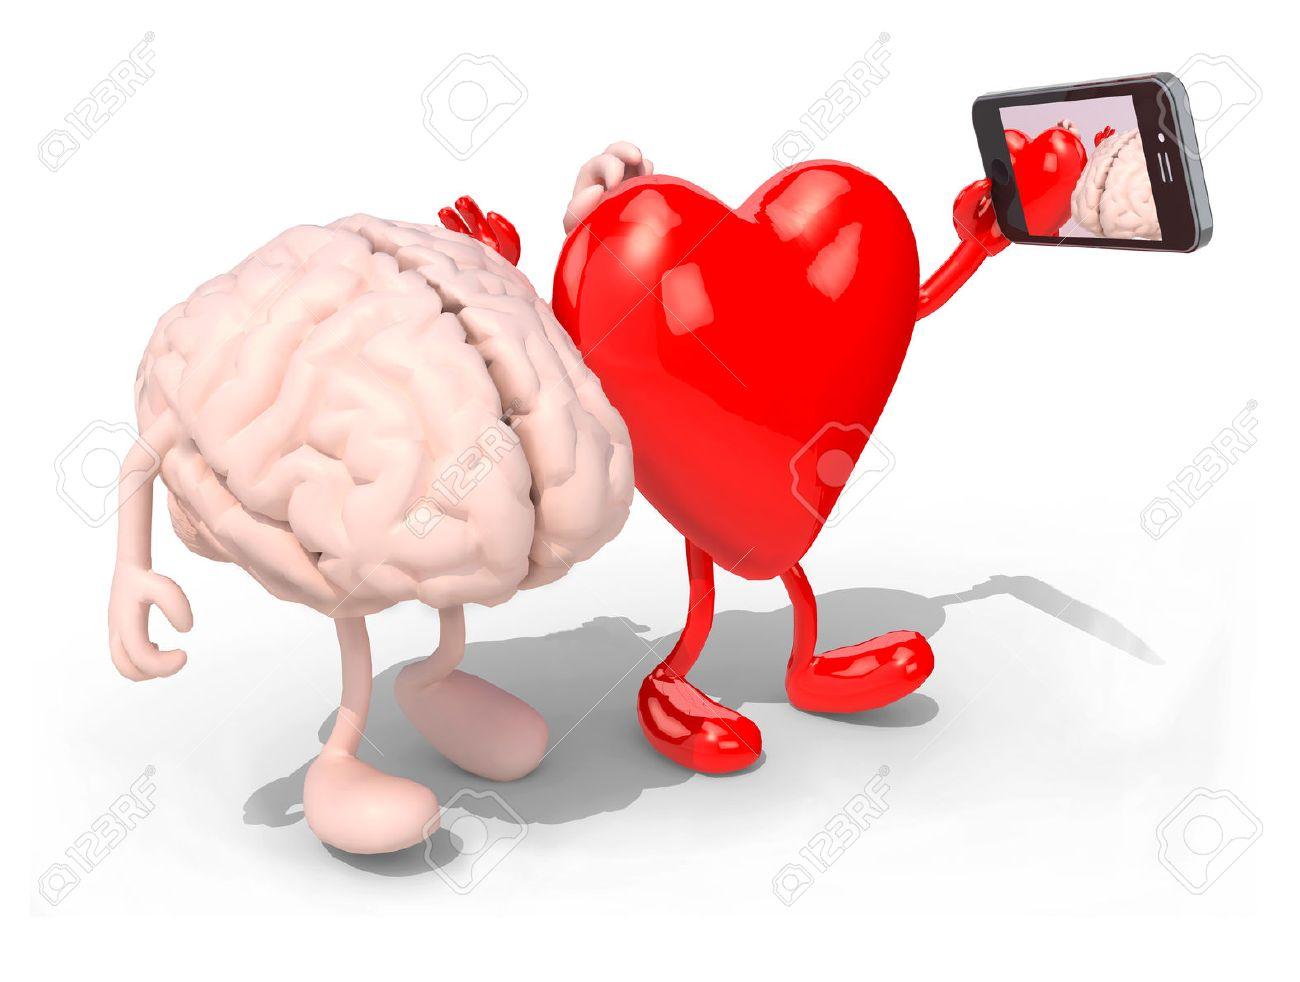 Human Heart Stock Photos Royalty Free Human Heart Images